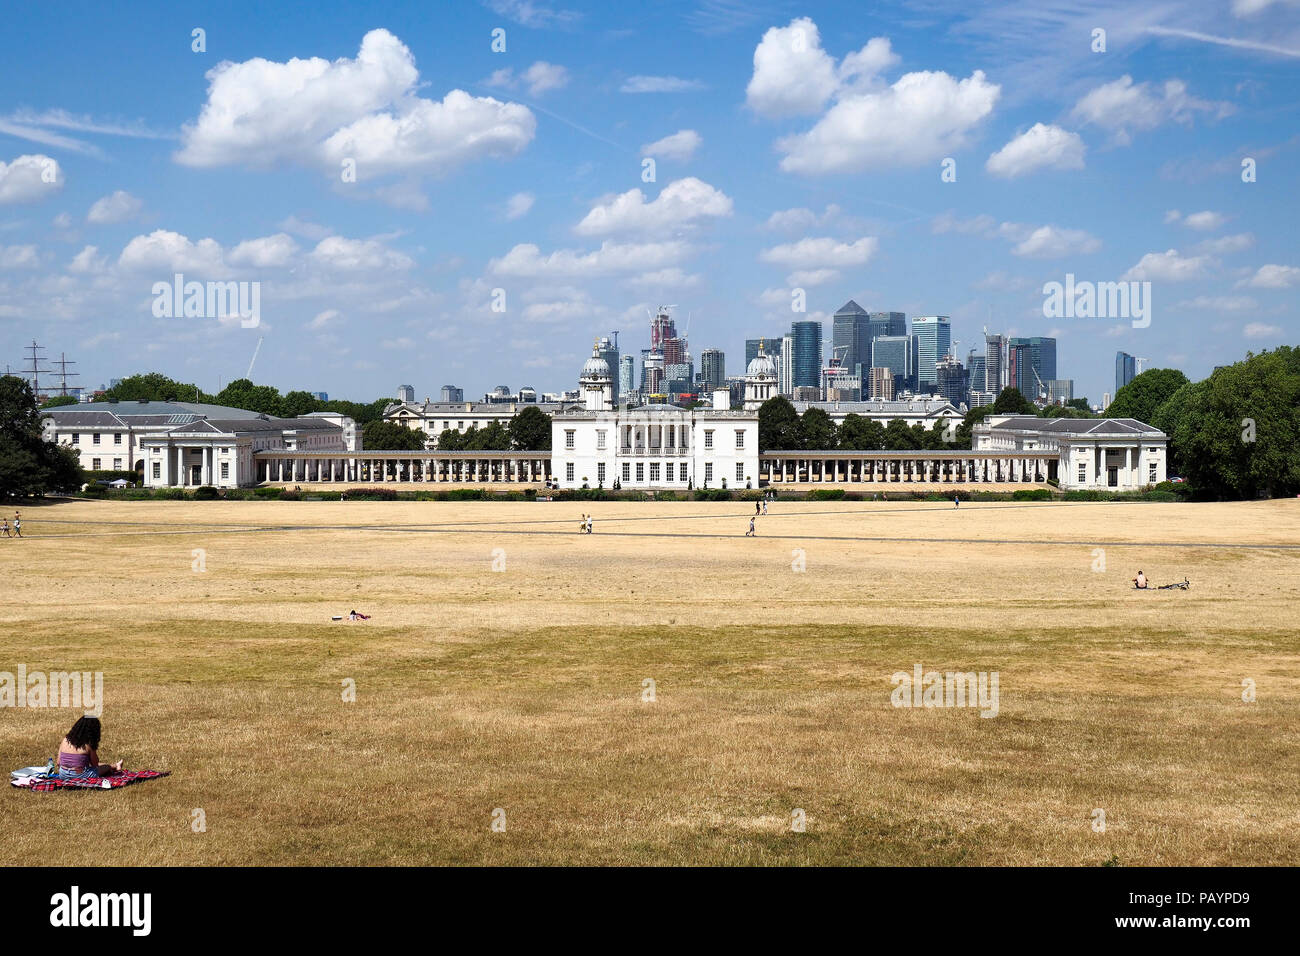 Greenwich Park London summer 2018 - Stock Image